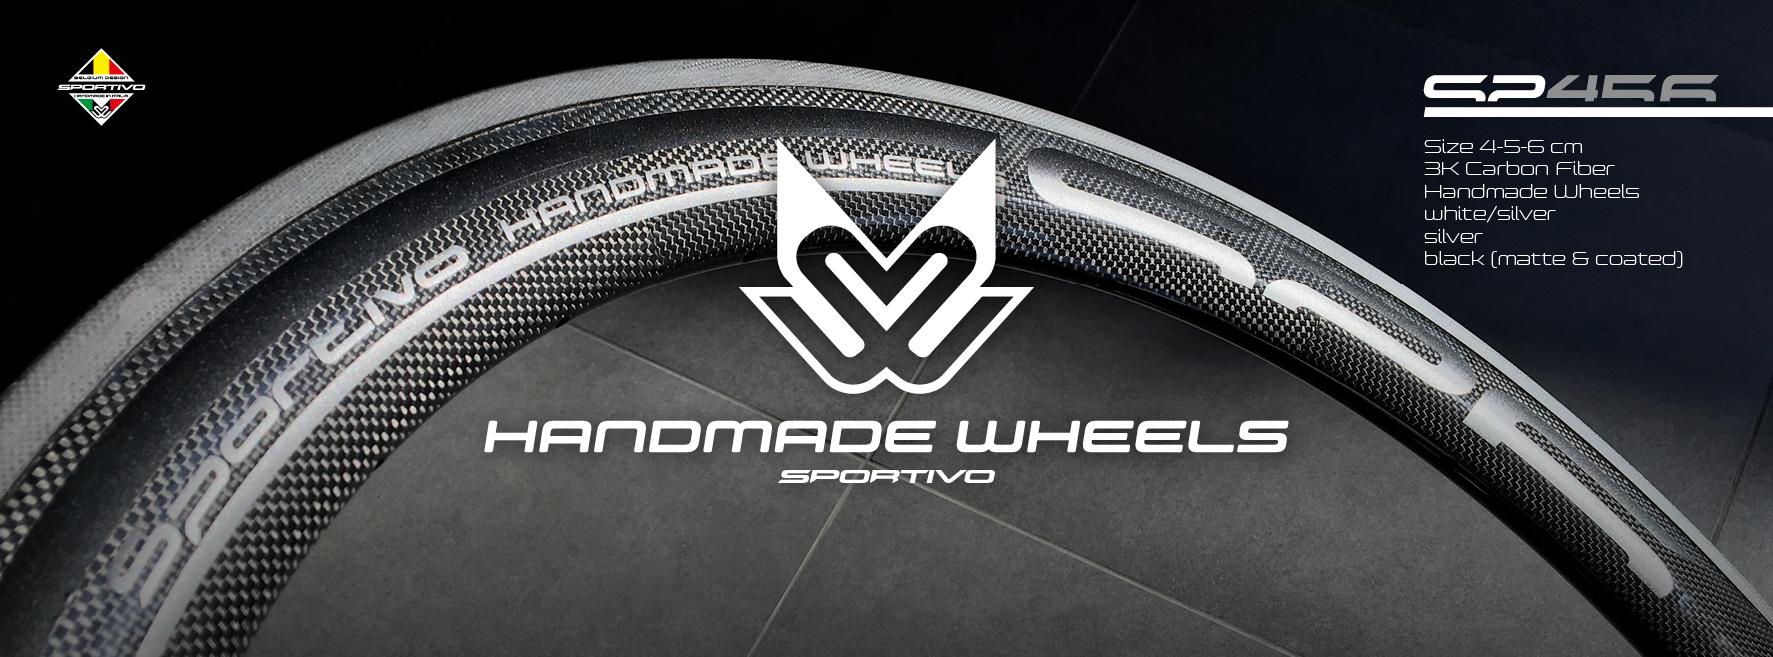 Sportivo - Handmade Wheels